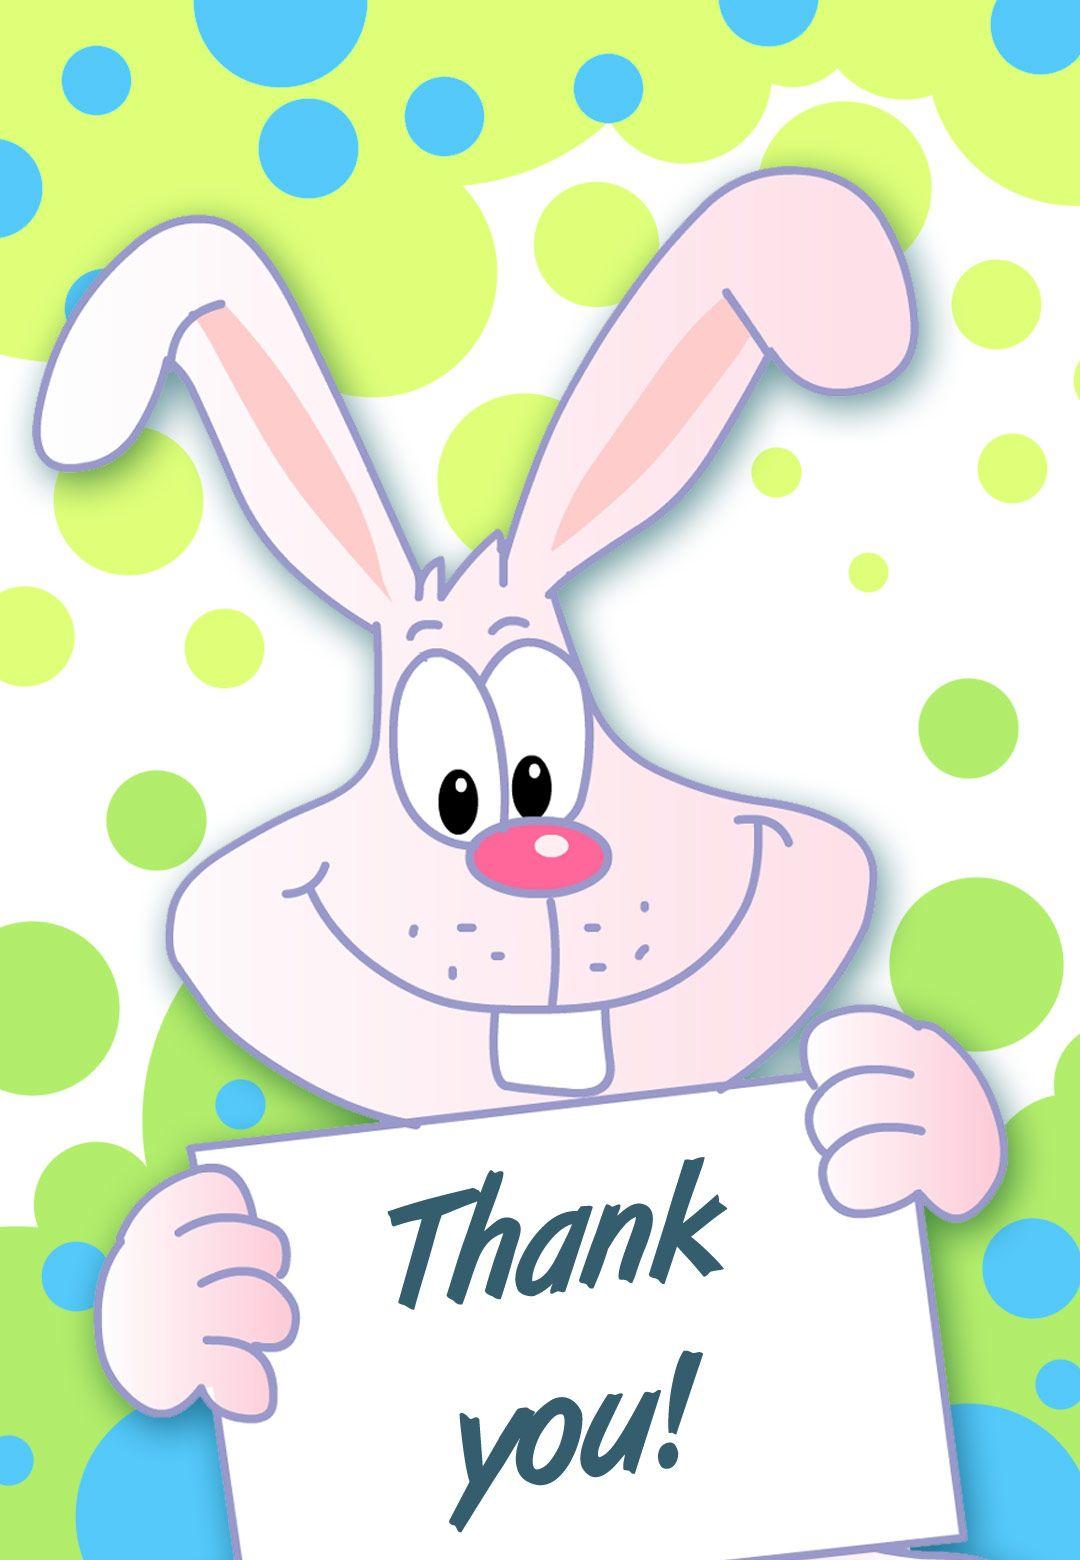 Free printable thank you greeting card morningday greeting in free printable thank you greeting card m4hsunfo